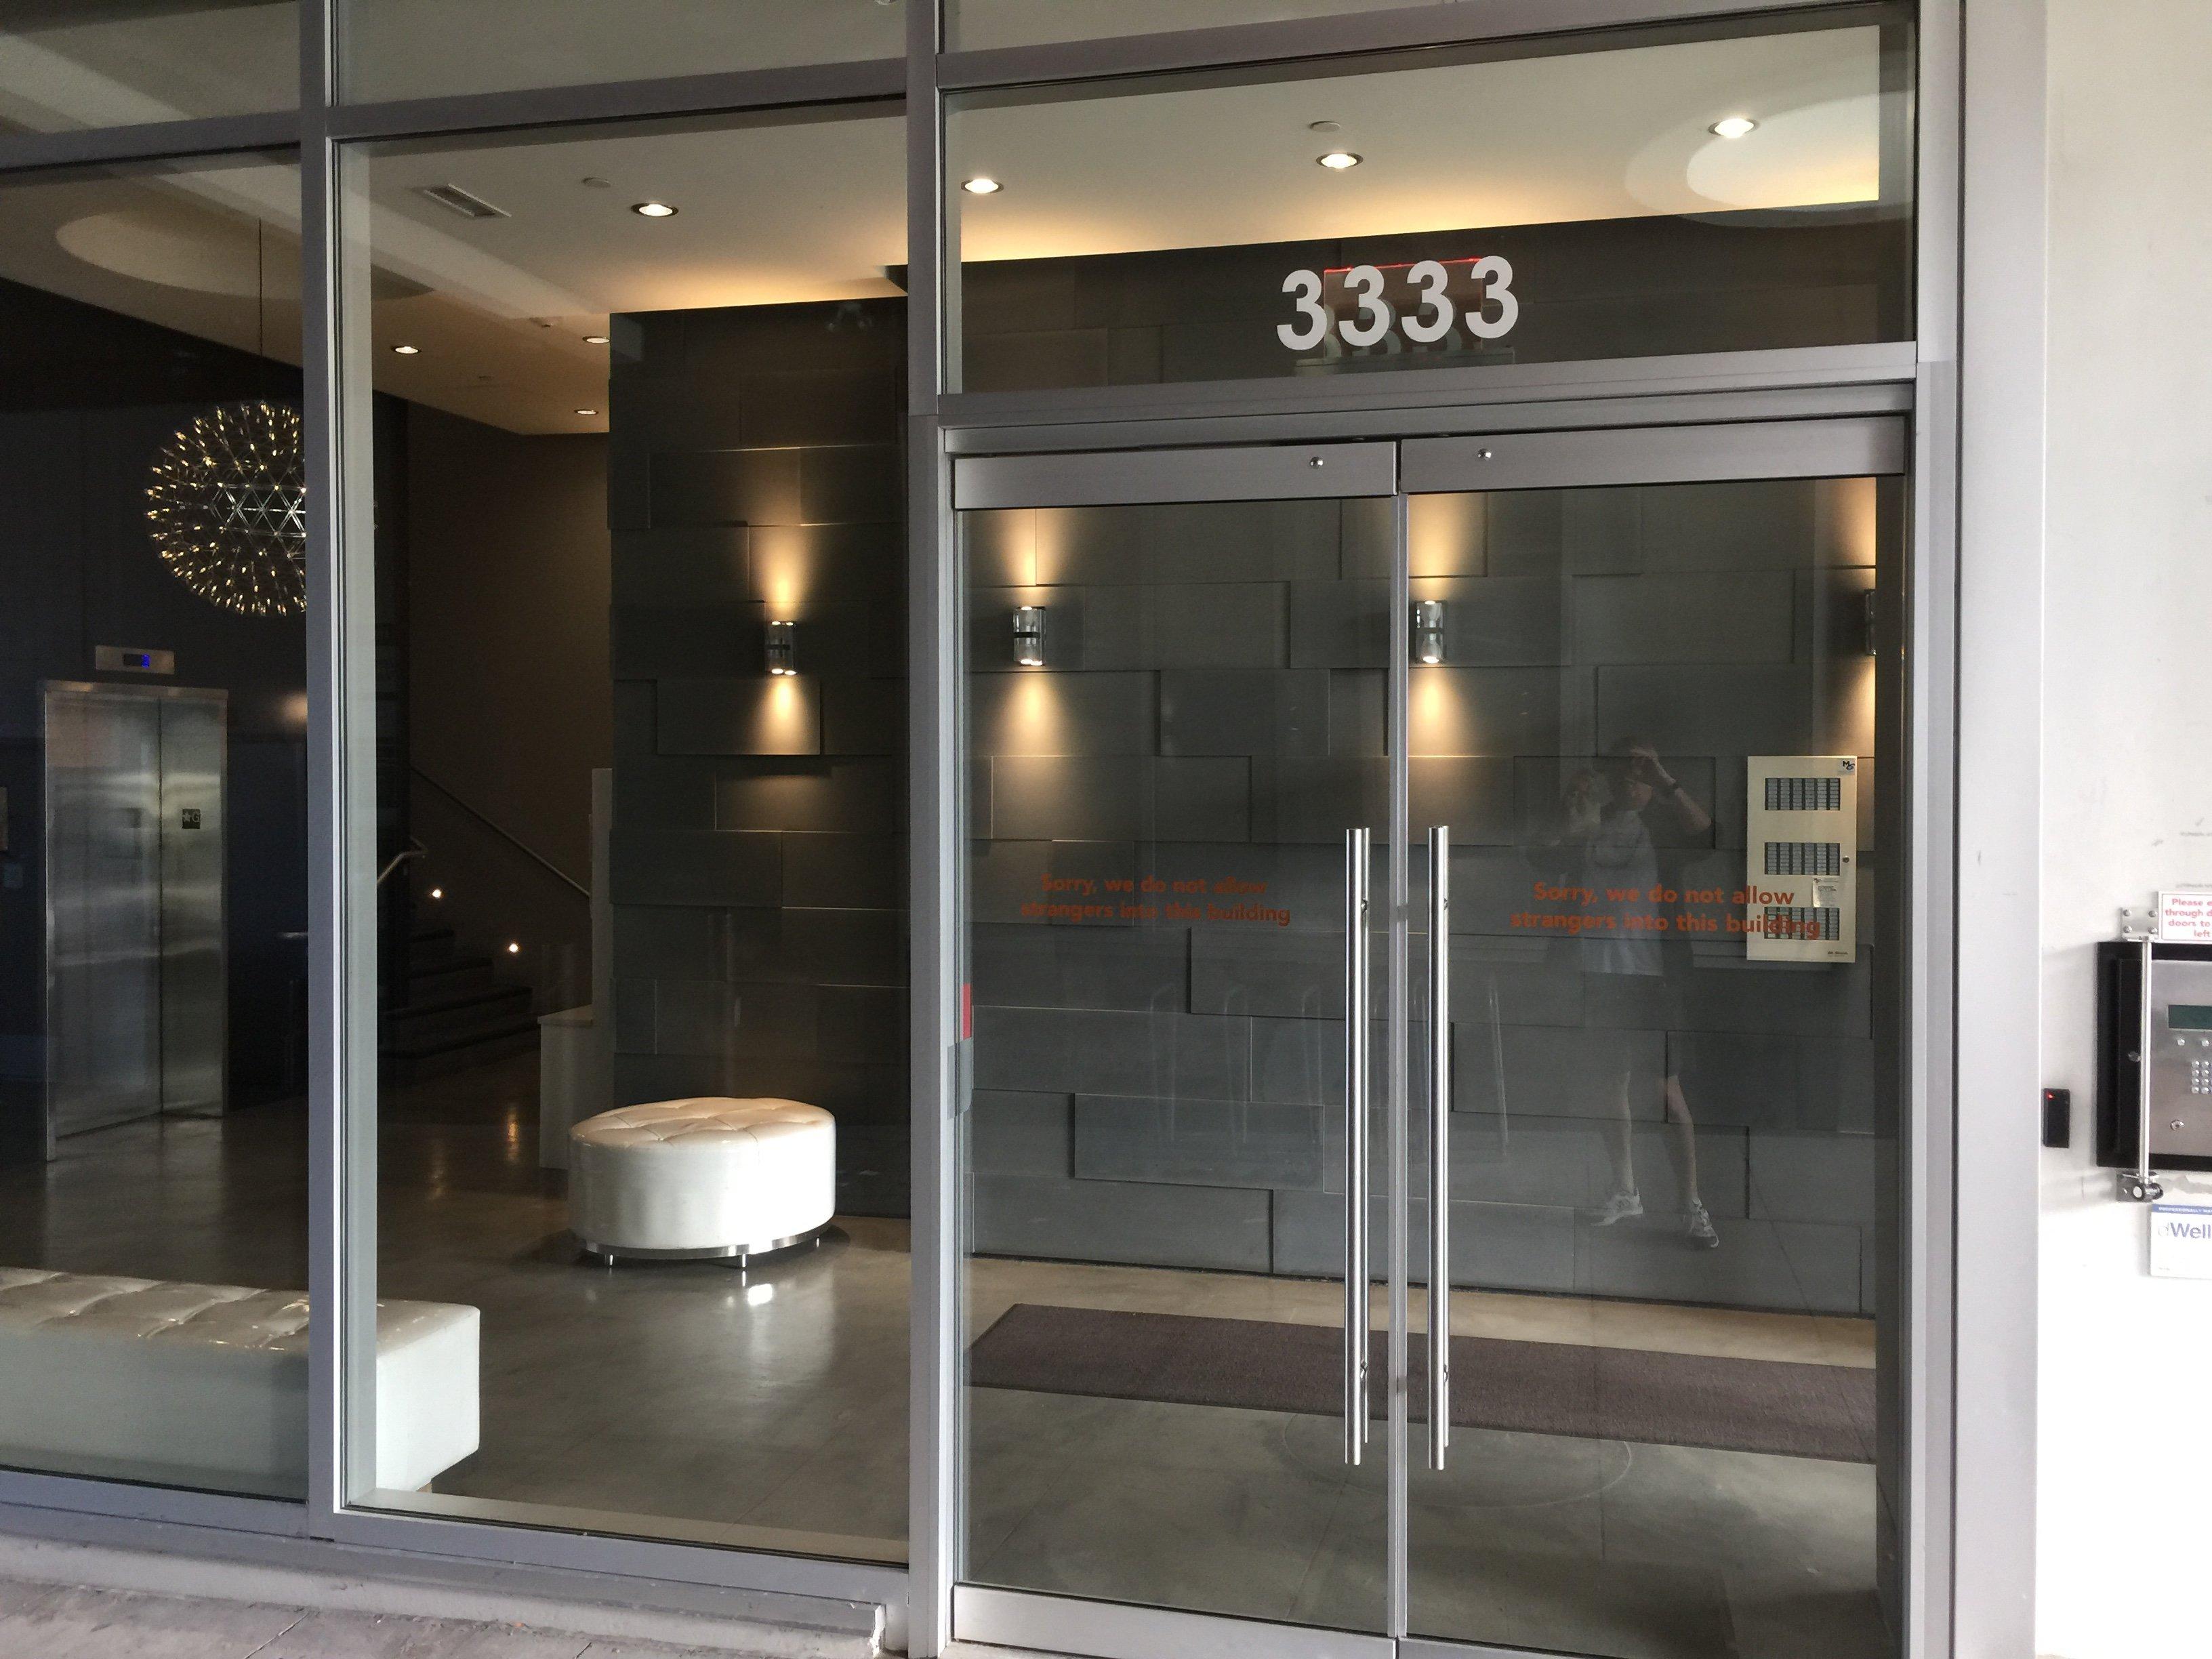 3333Main Entrance!